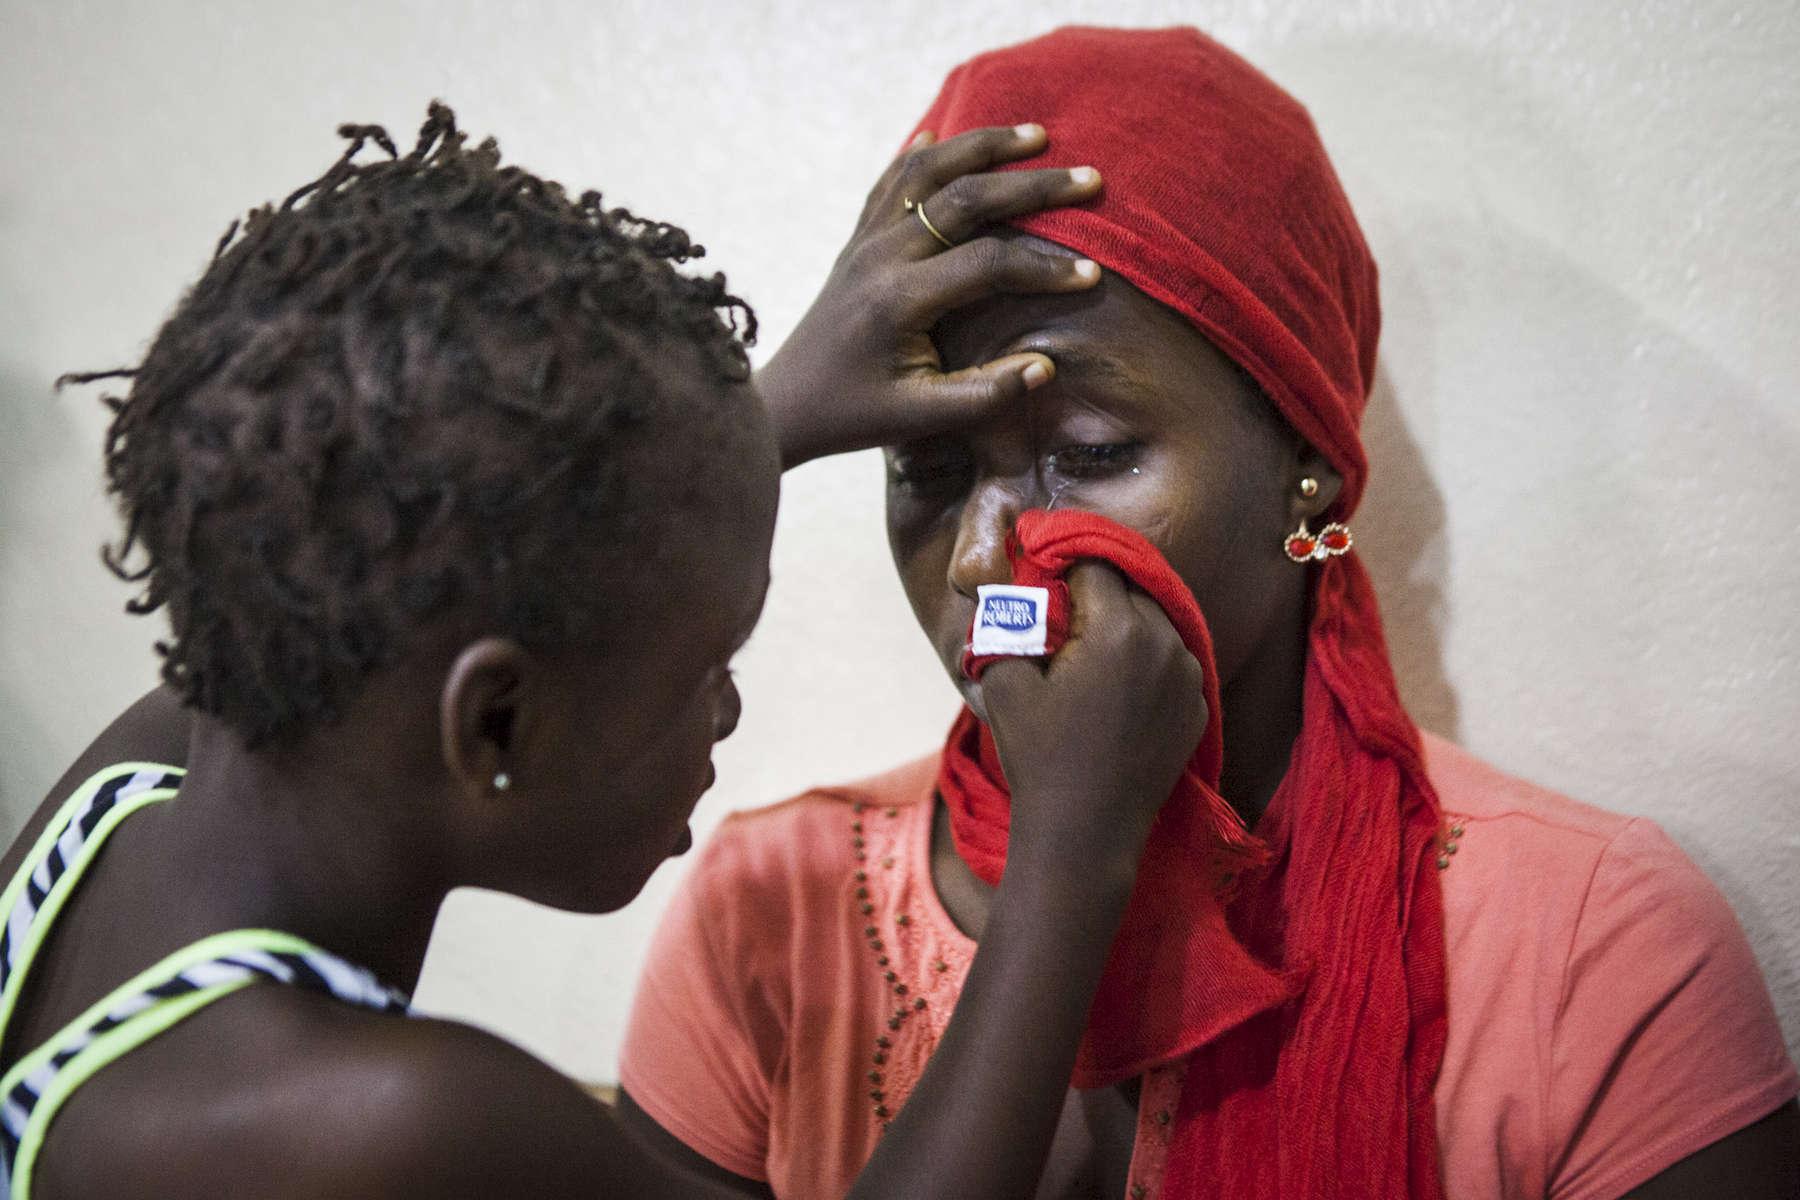 Aminata Conteh, 8, carefully wipes around the eye of a fellow ebola survivor at the Kissy United Methodist Church Eye Hospital in Freetown, Sierra Leone.